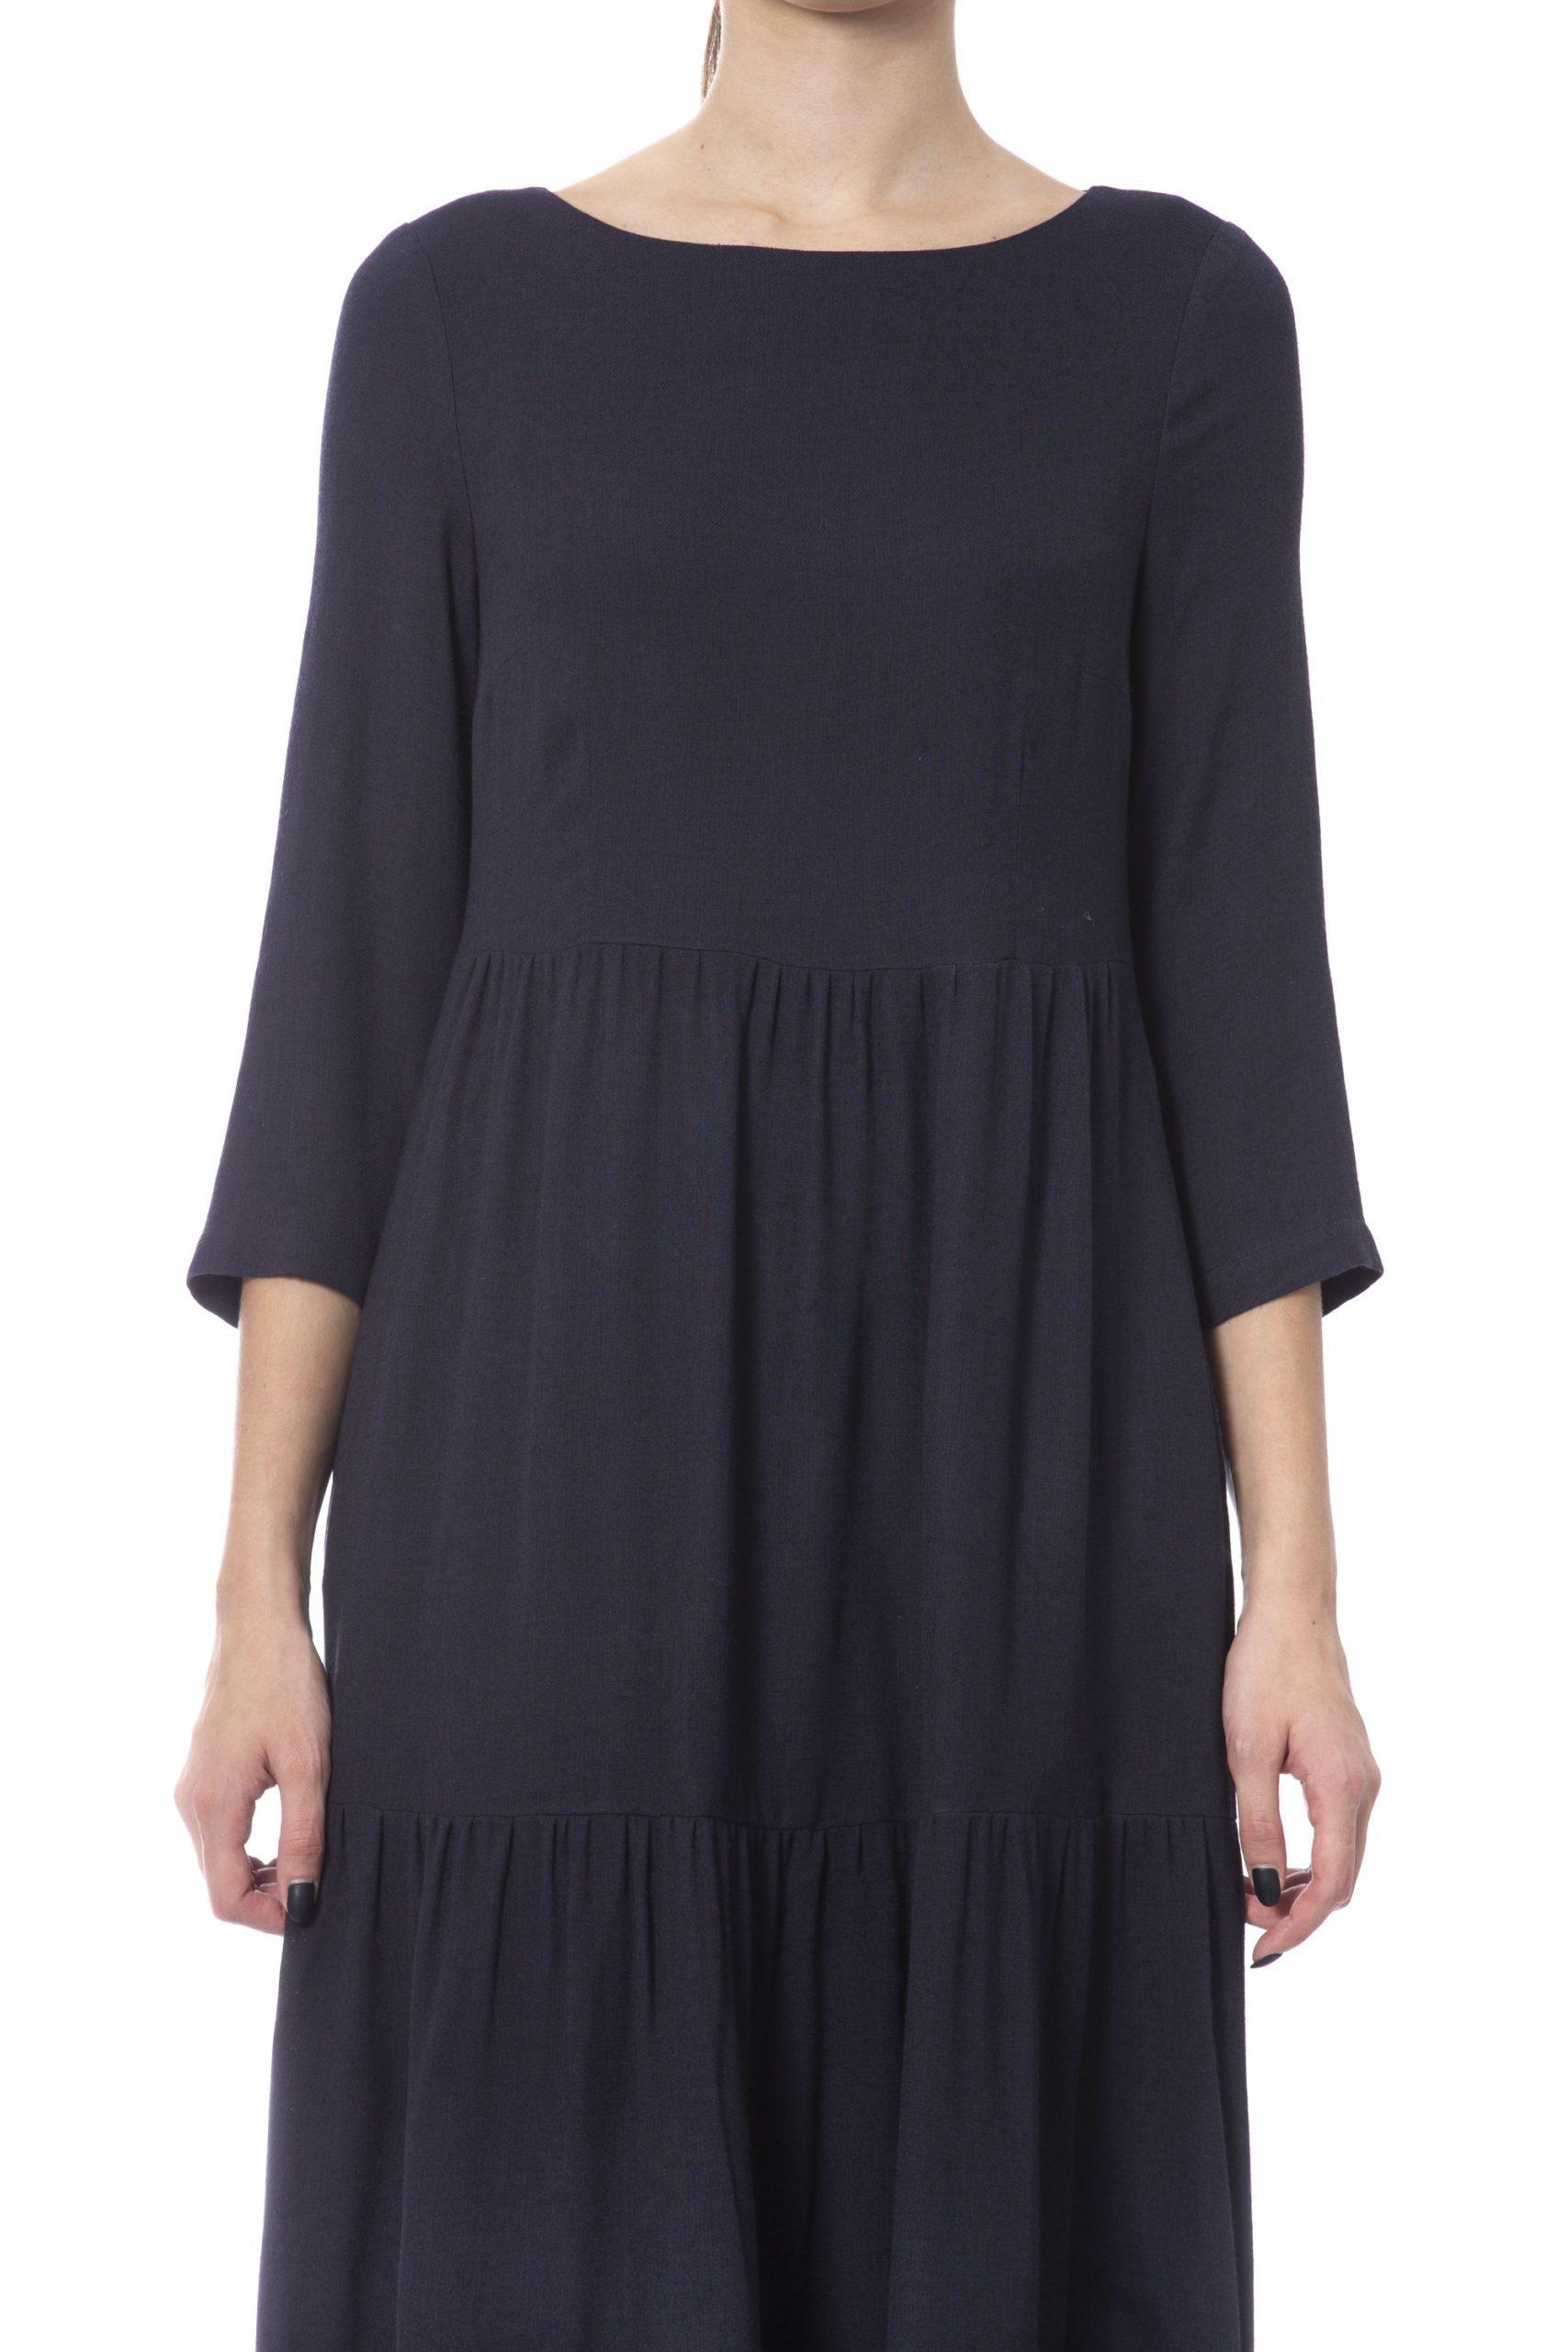 Peserico Women's Dress Blue PE993668 - IT42 | S